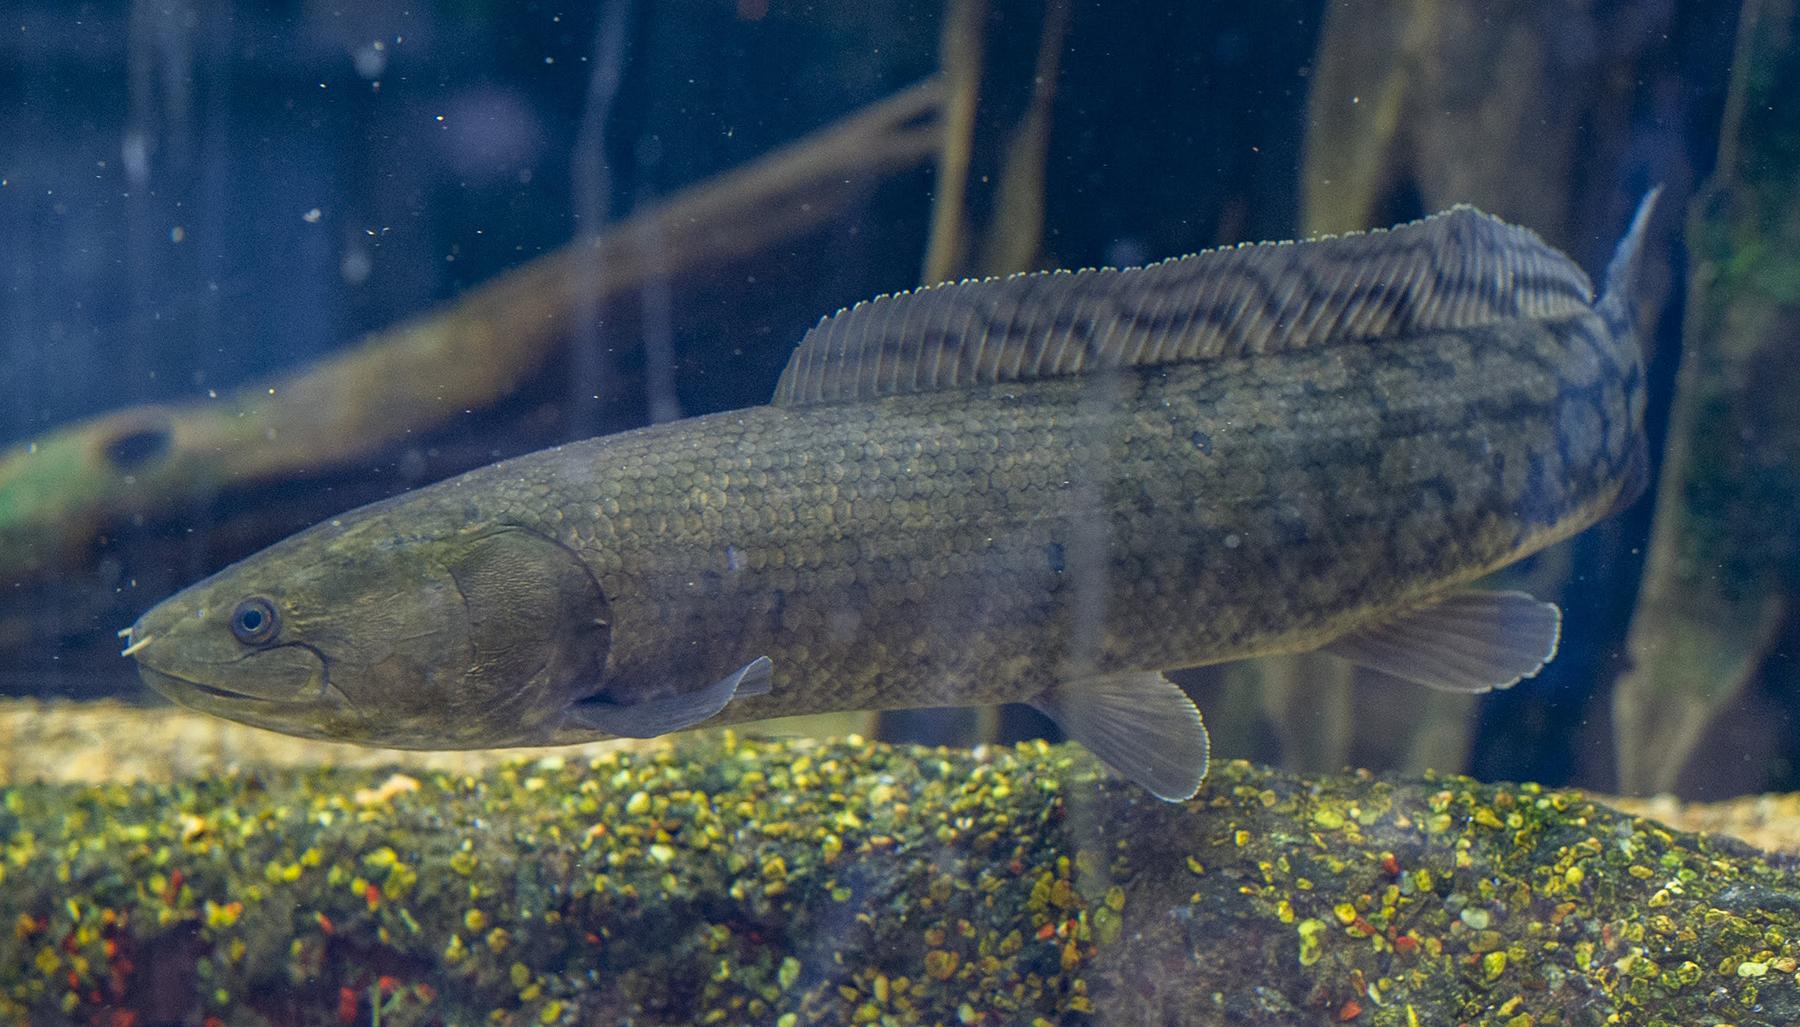 Bowfin Amoa calva TN Aquarium Casey Phillips